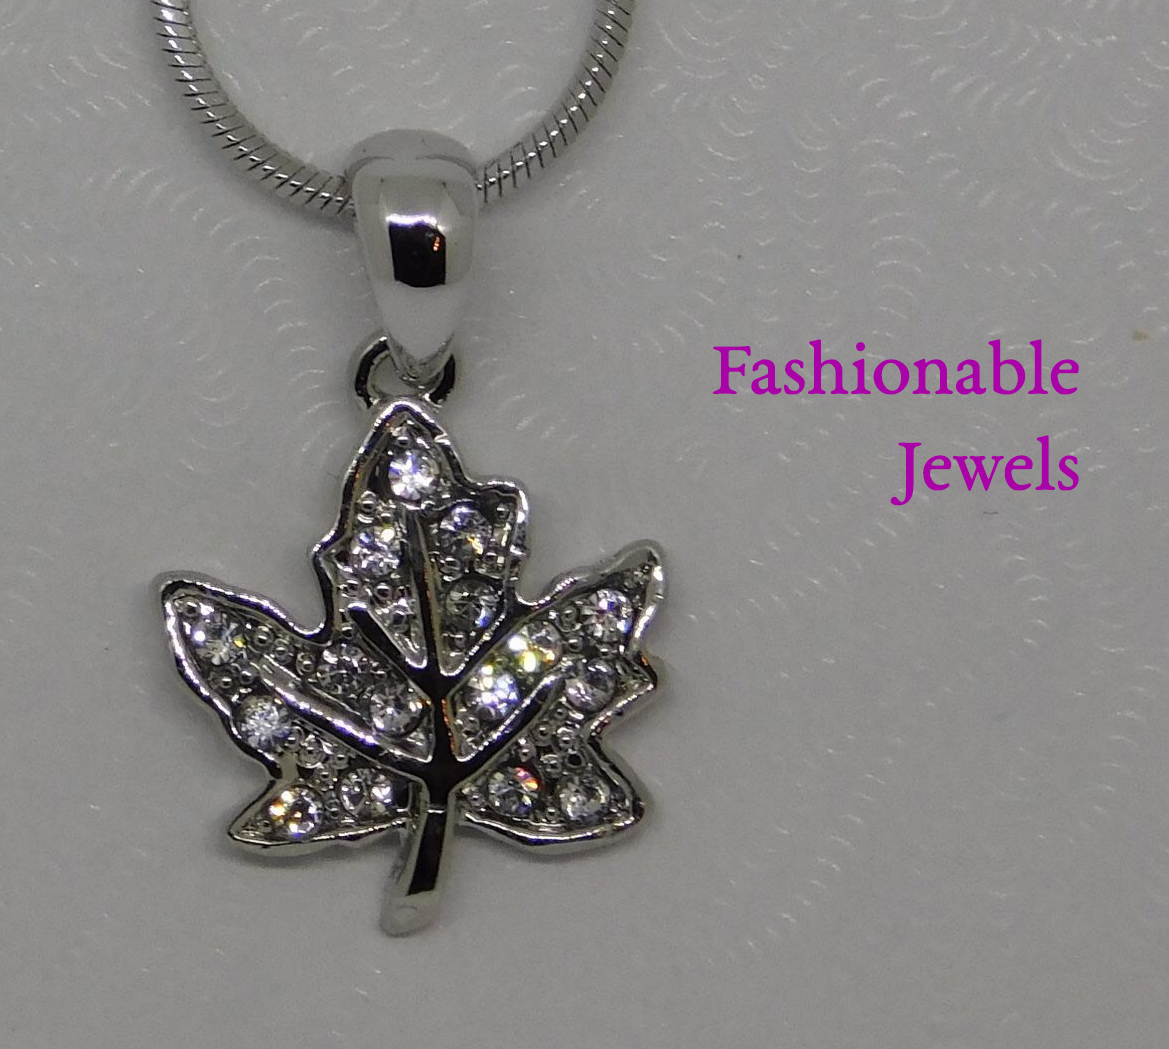 FashionableJewels_Image-7.jpg